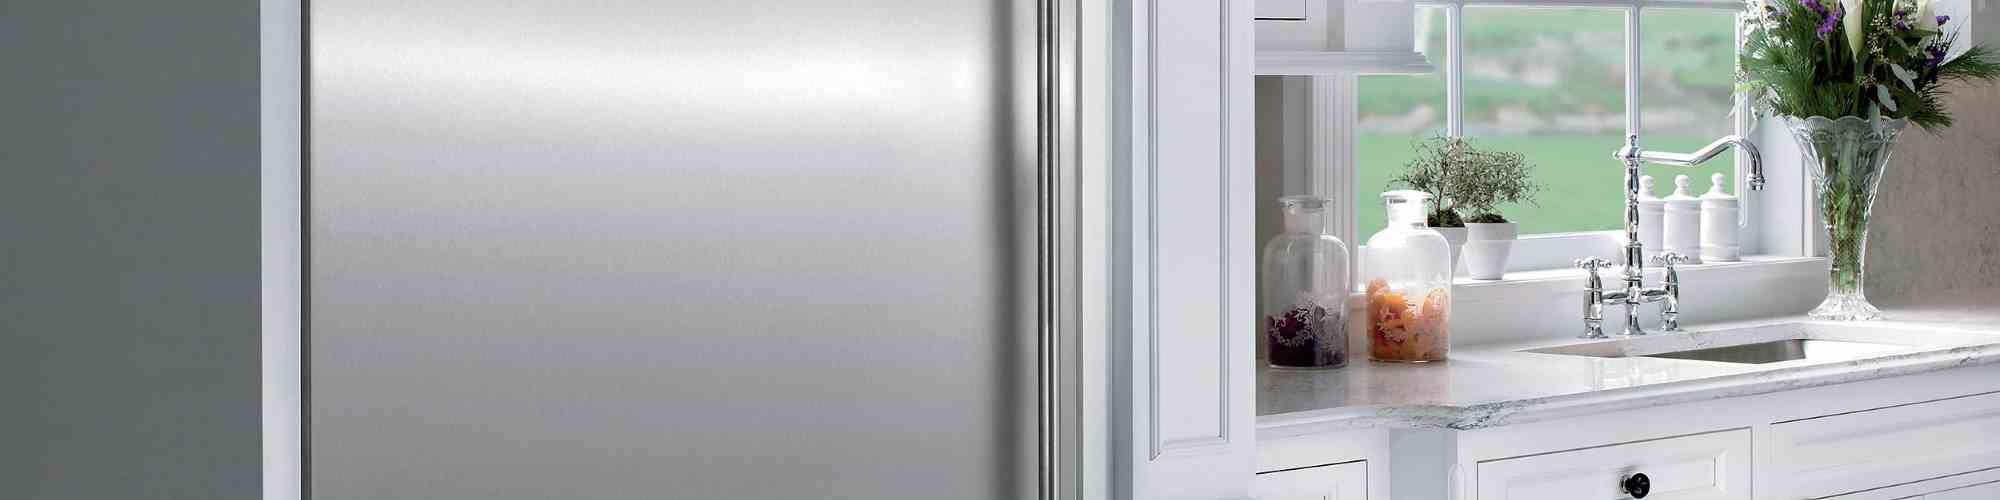 SubZero Refrigerator Close Up